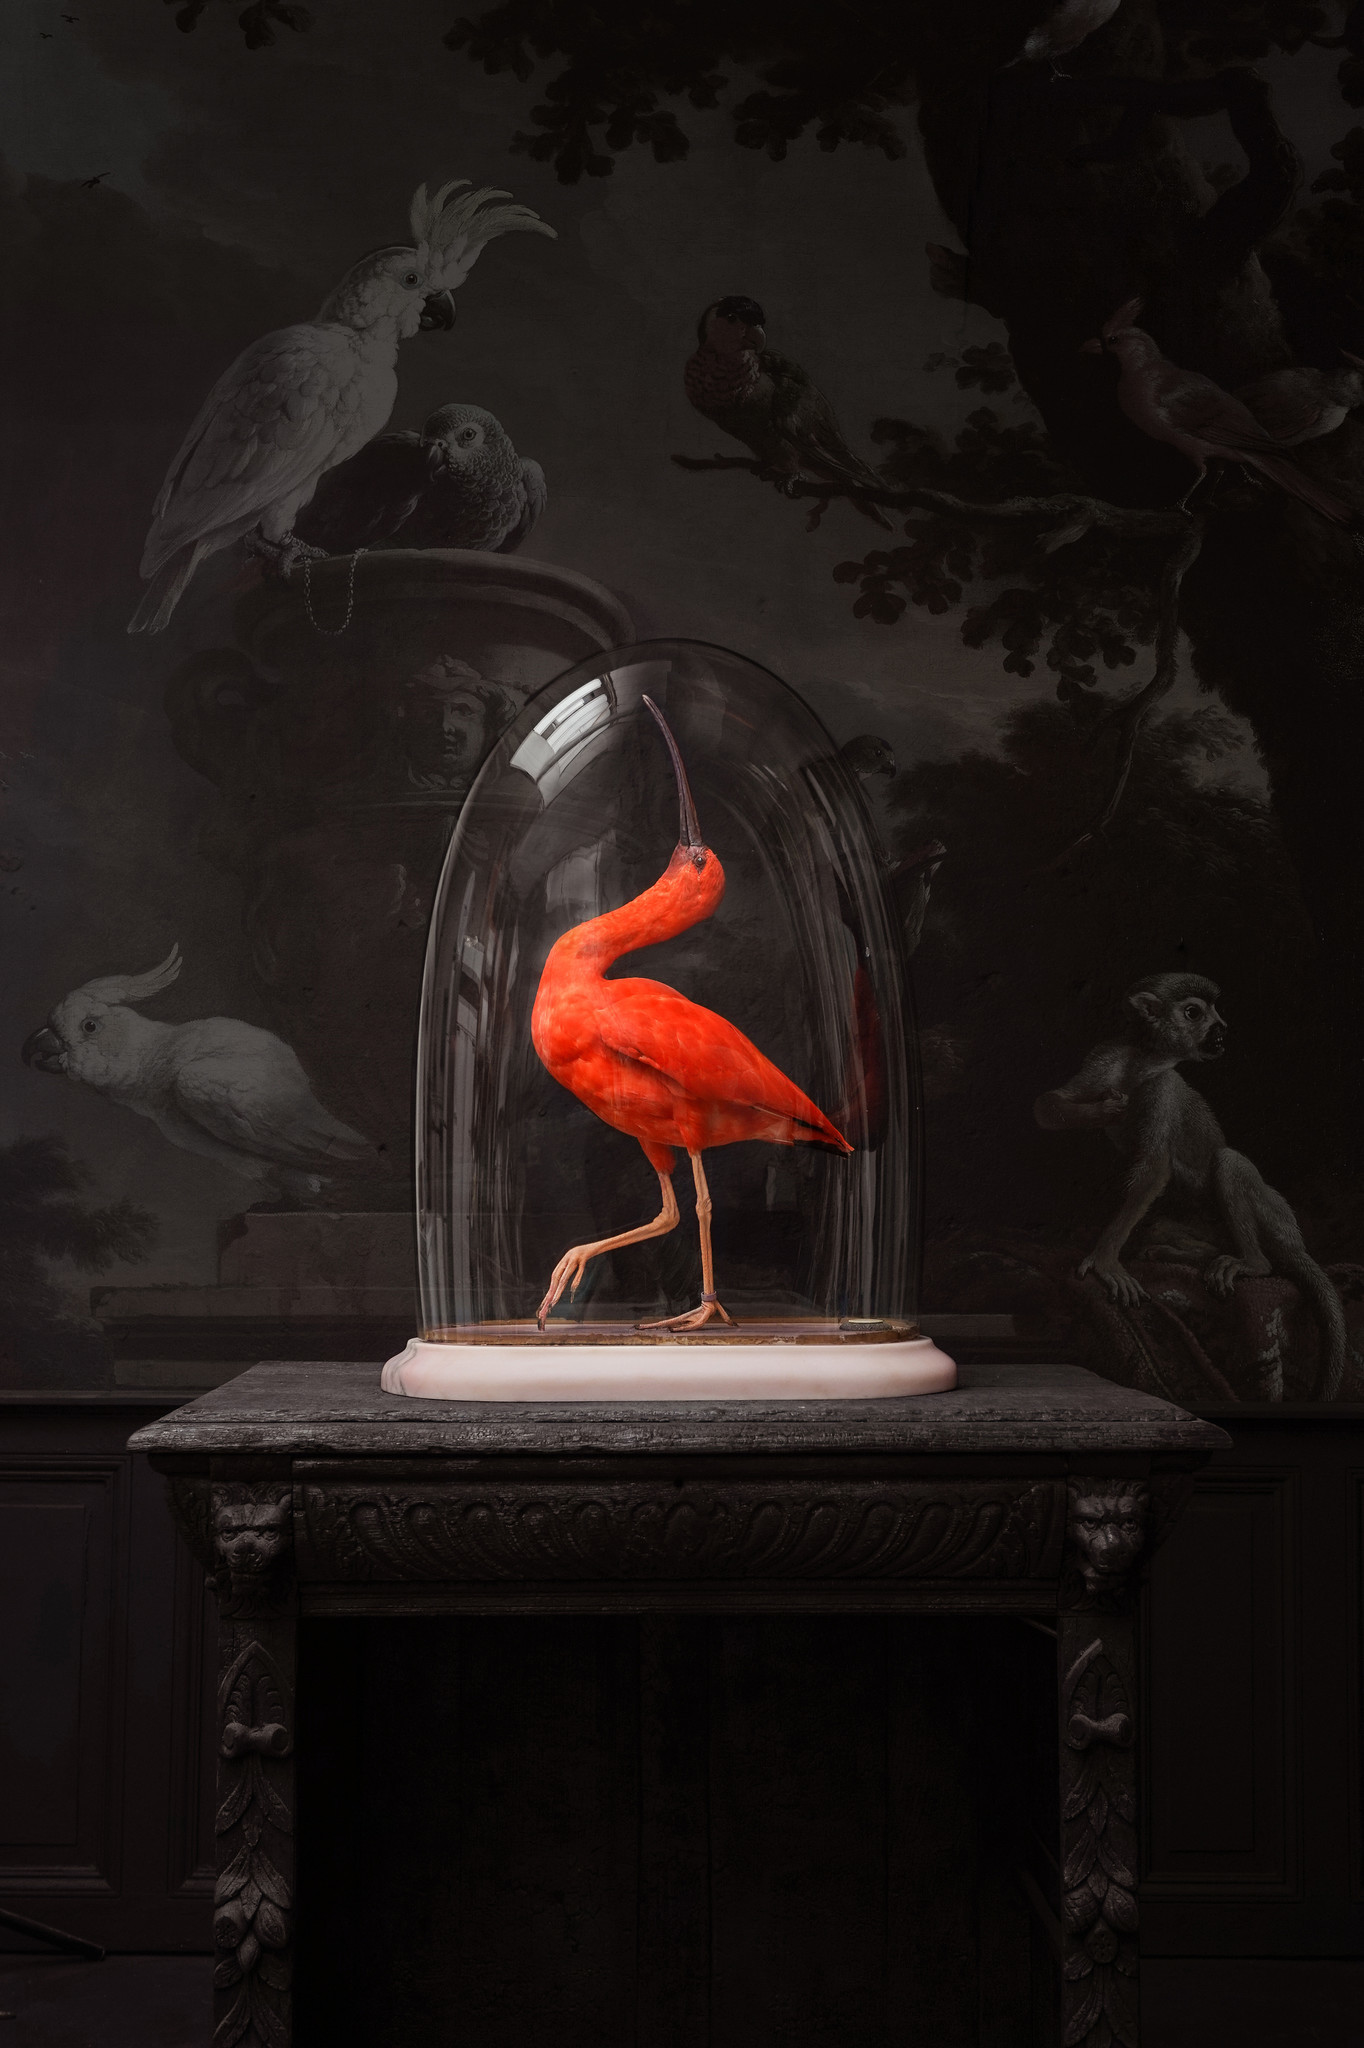 A scarlet ibis